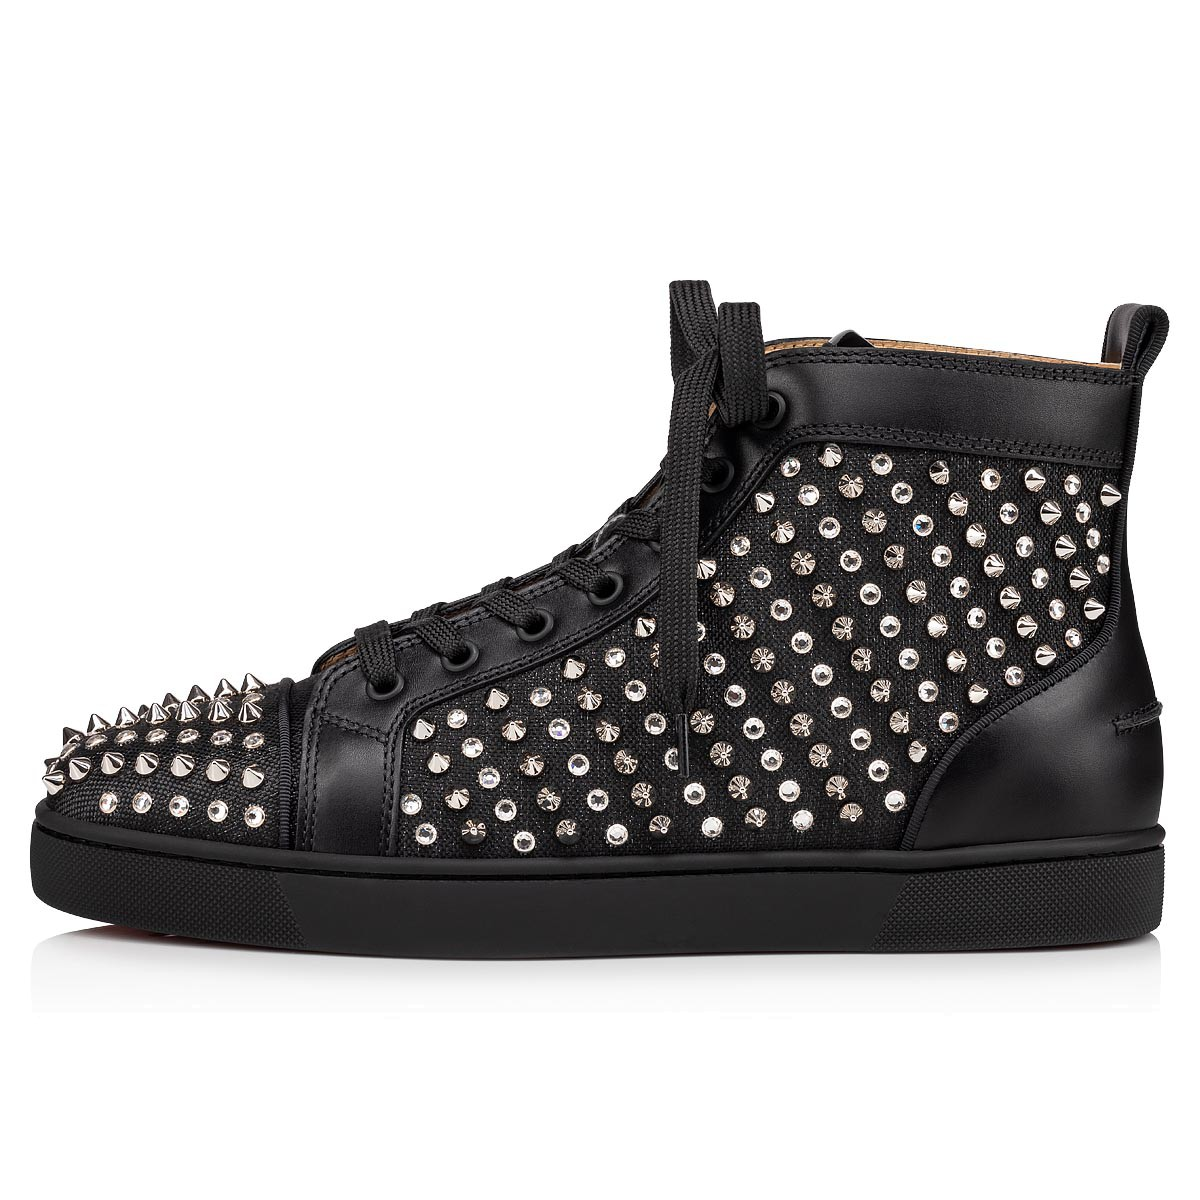 Shoes - Louis 1c1s Flat - Christian Louboutin